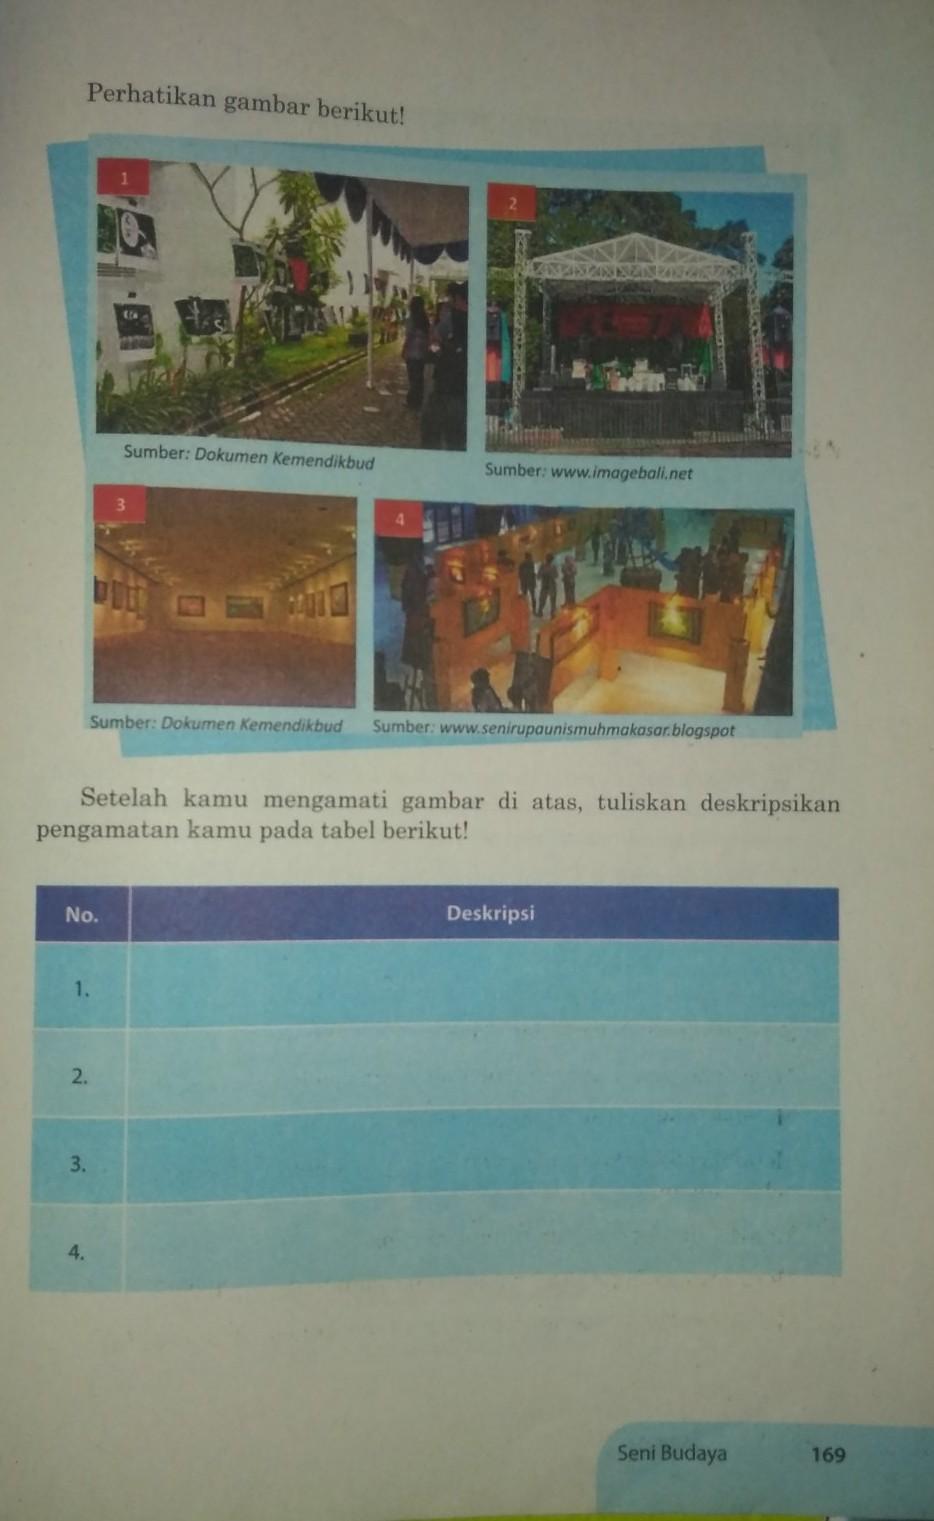 Seni Budaya Kelas 9 Halaman 169 Brainly Co Id